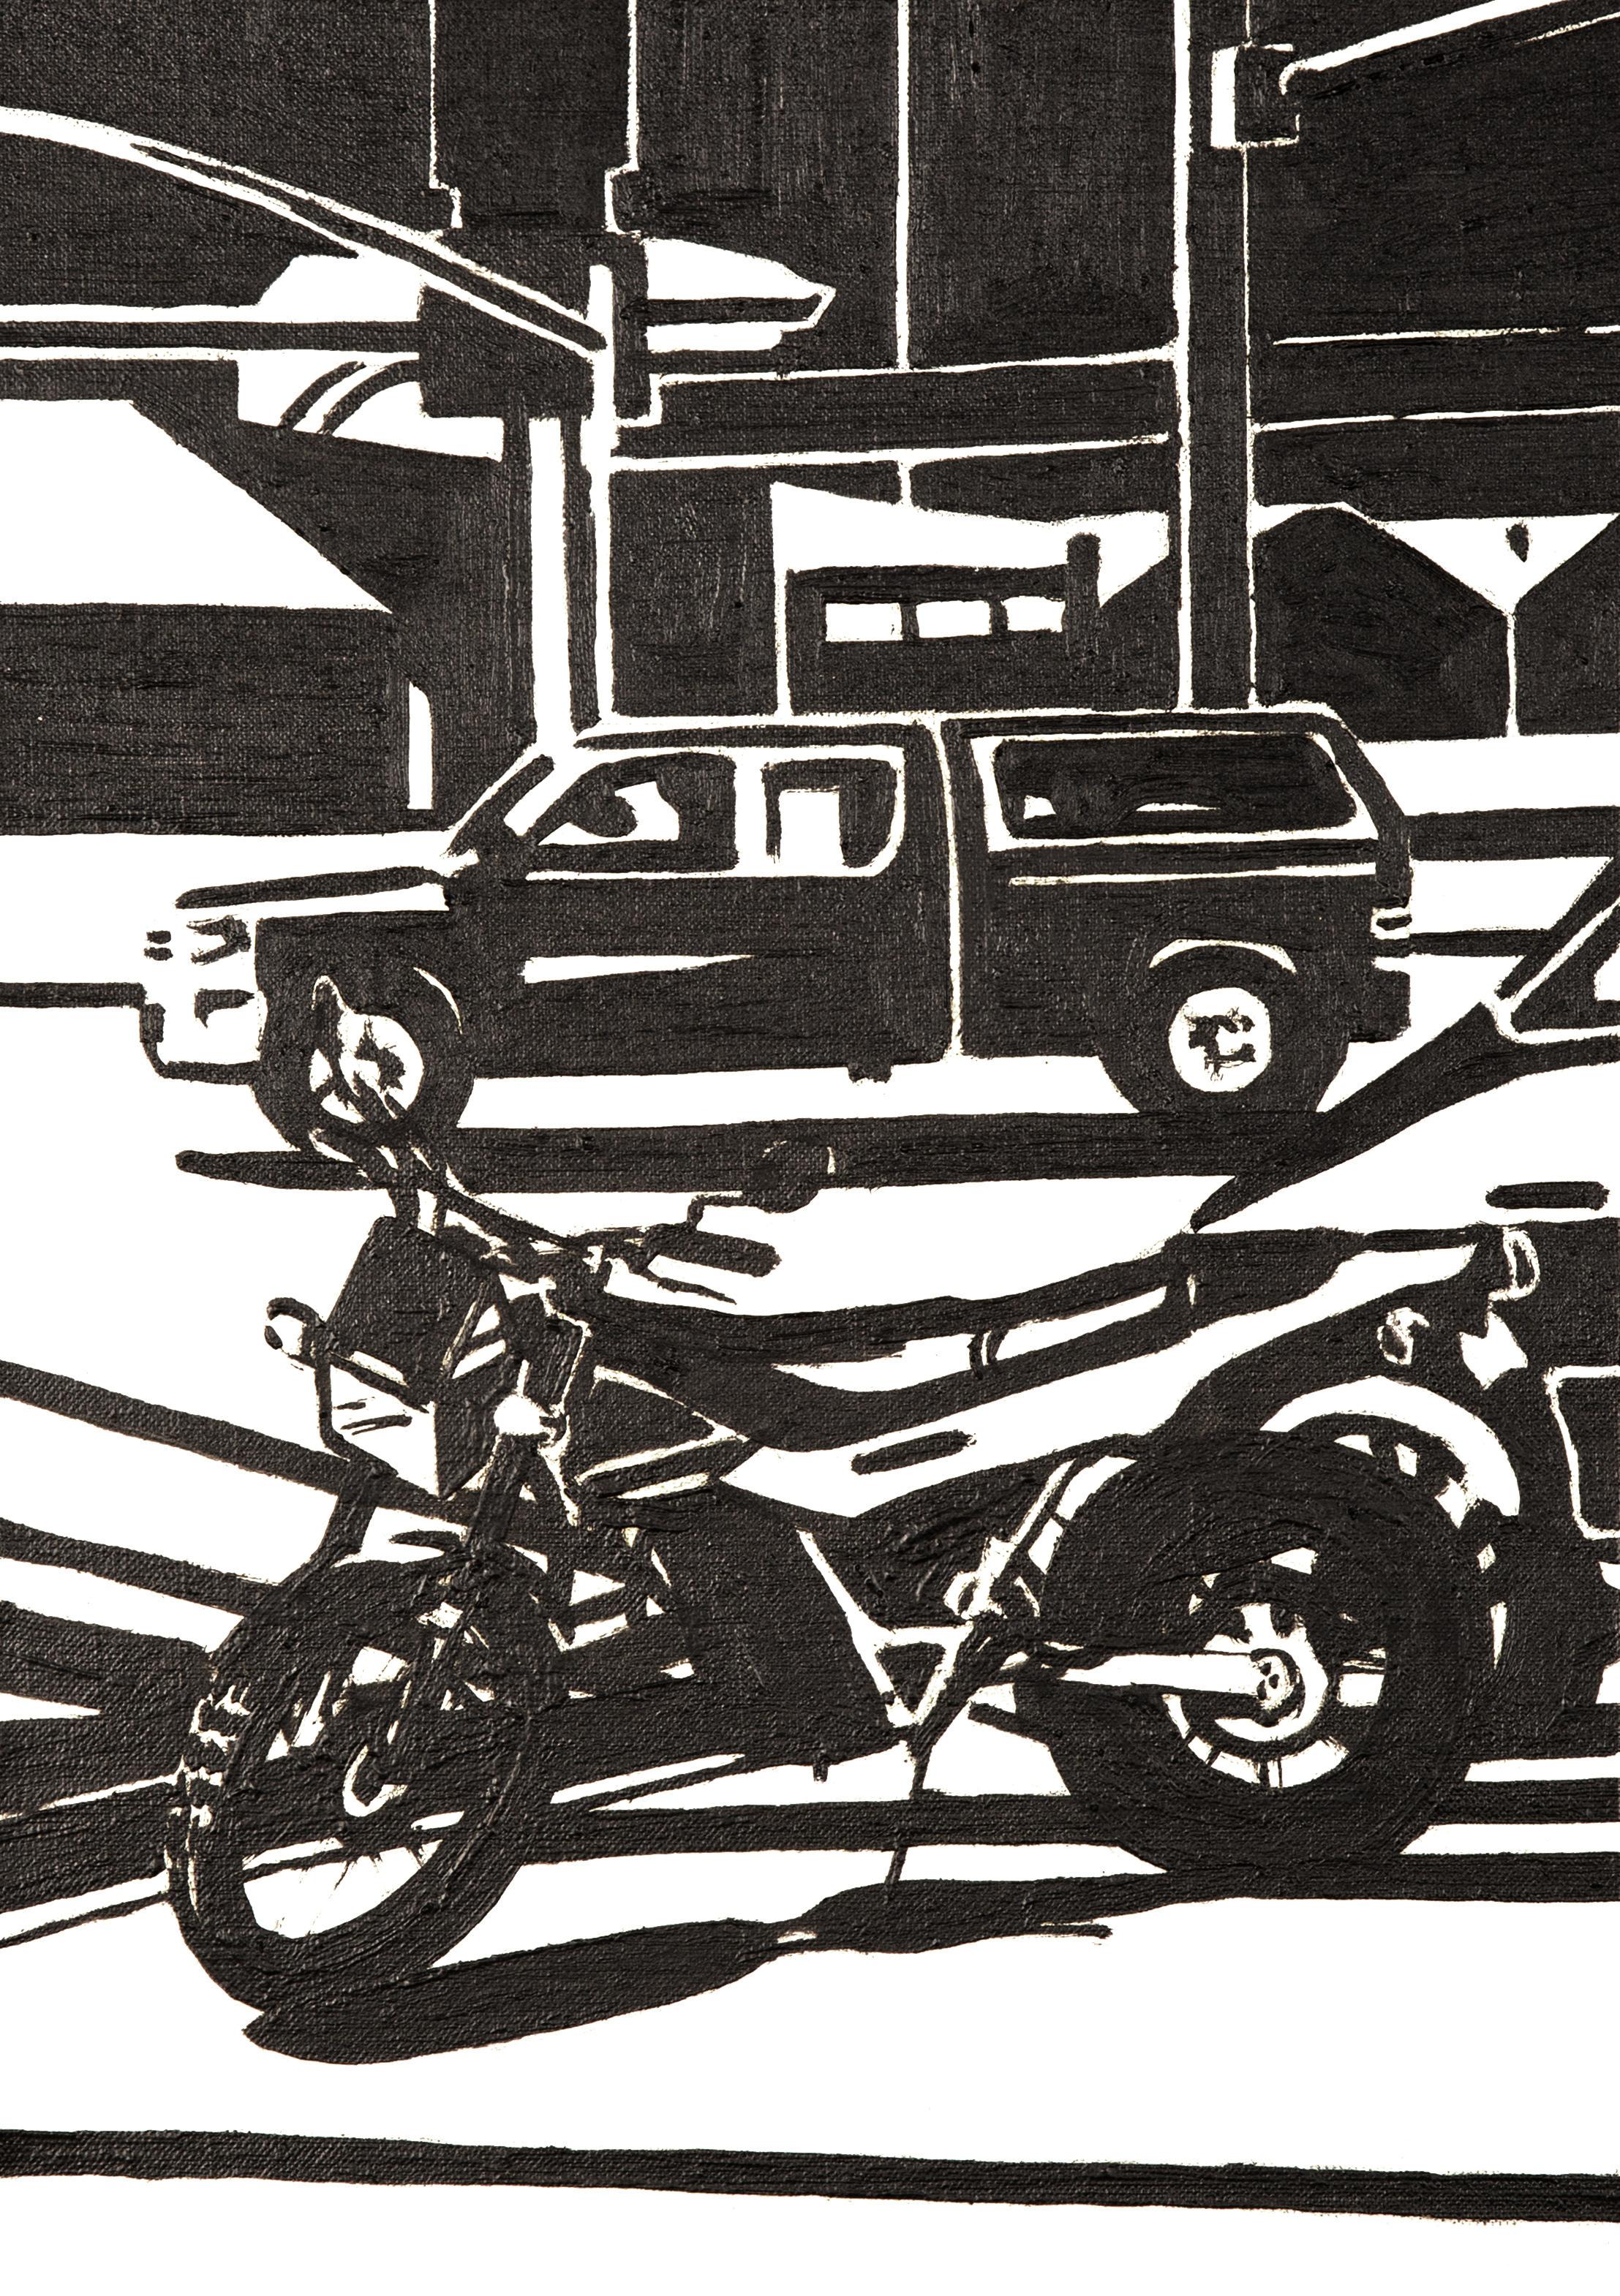 Bike and car, 2016, Oil on linen